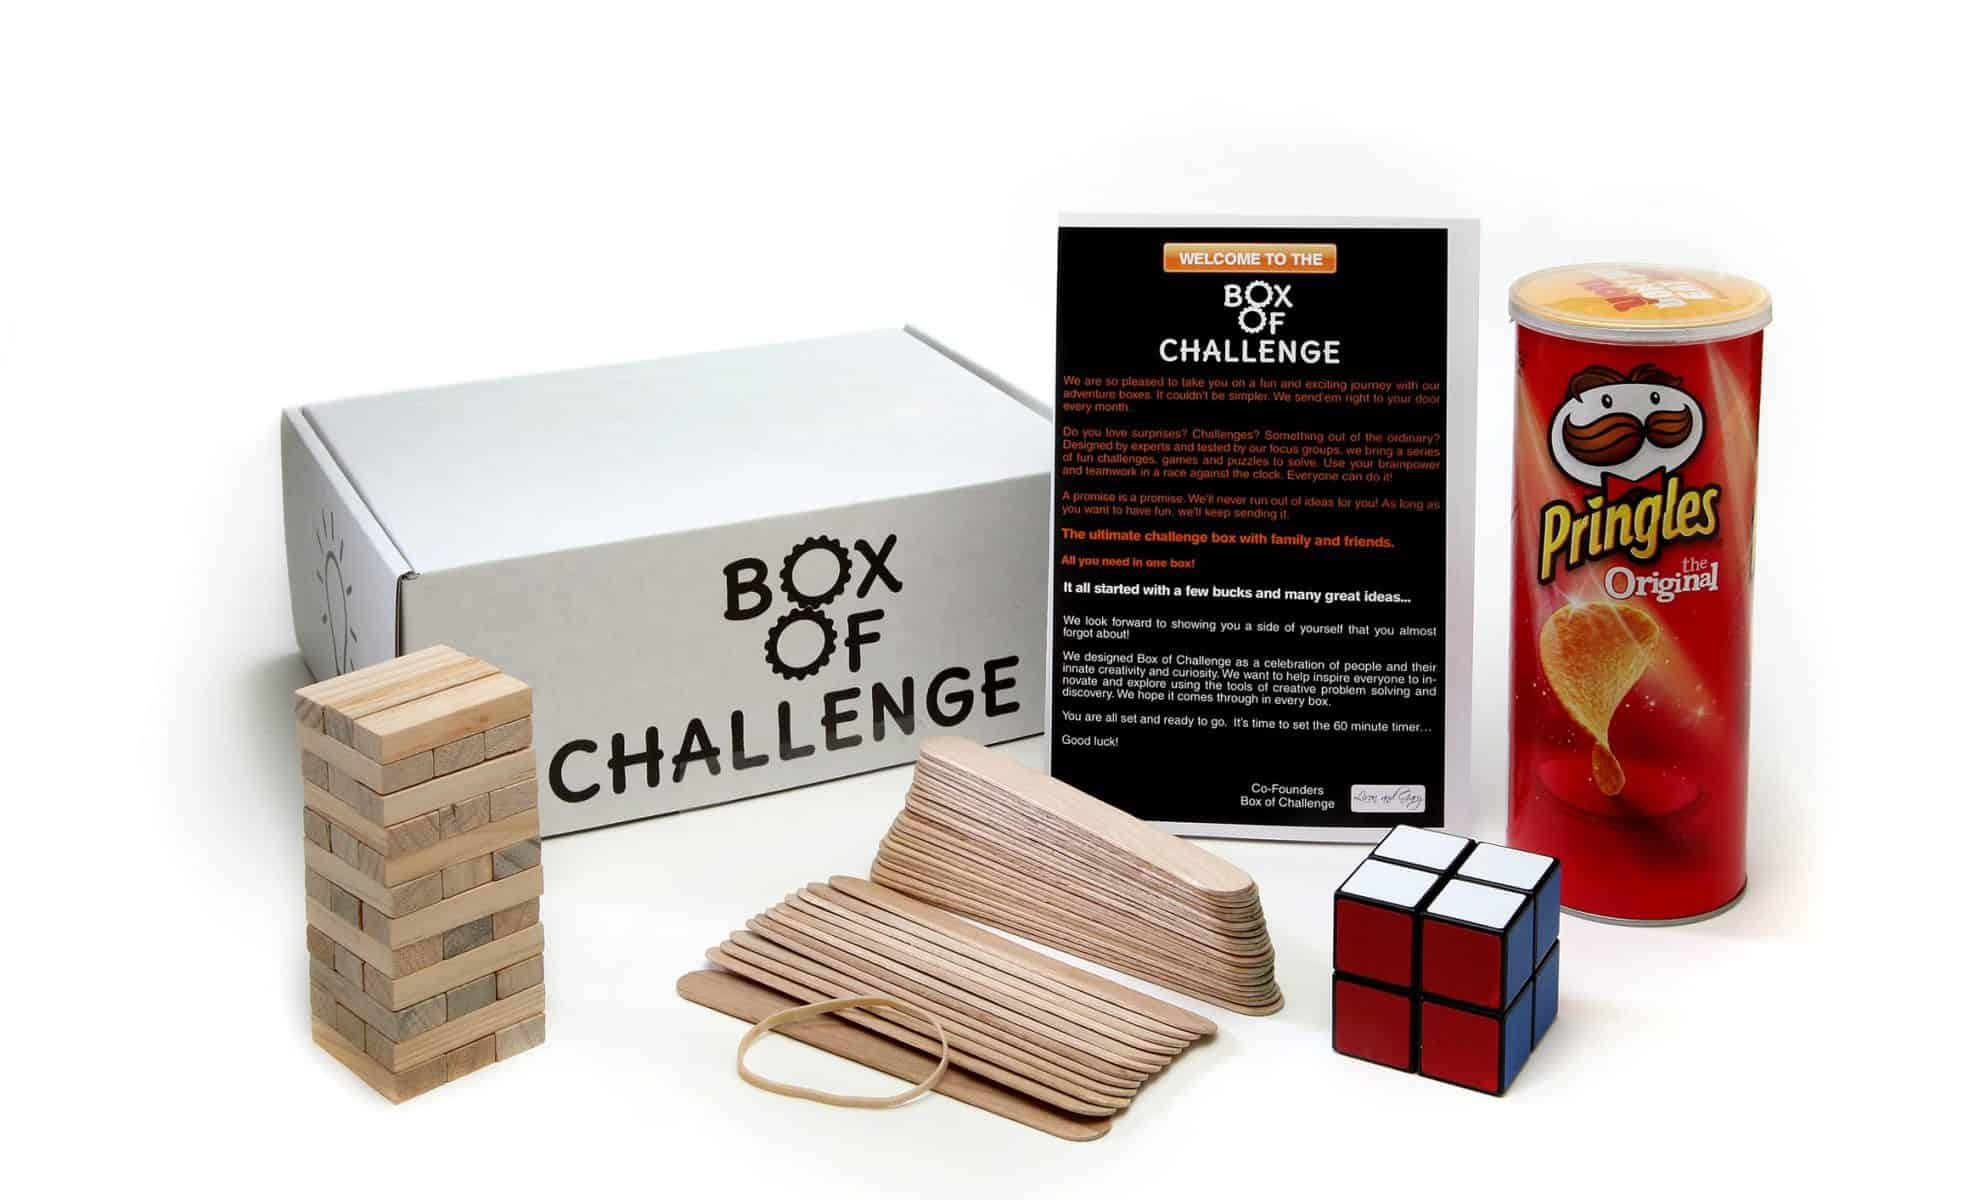 Box of Challenge Subscription Box